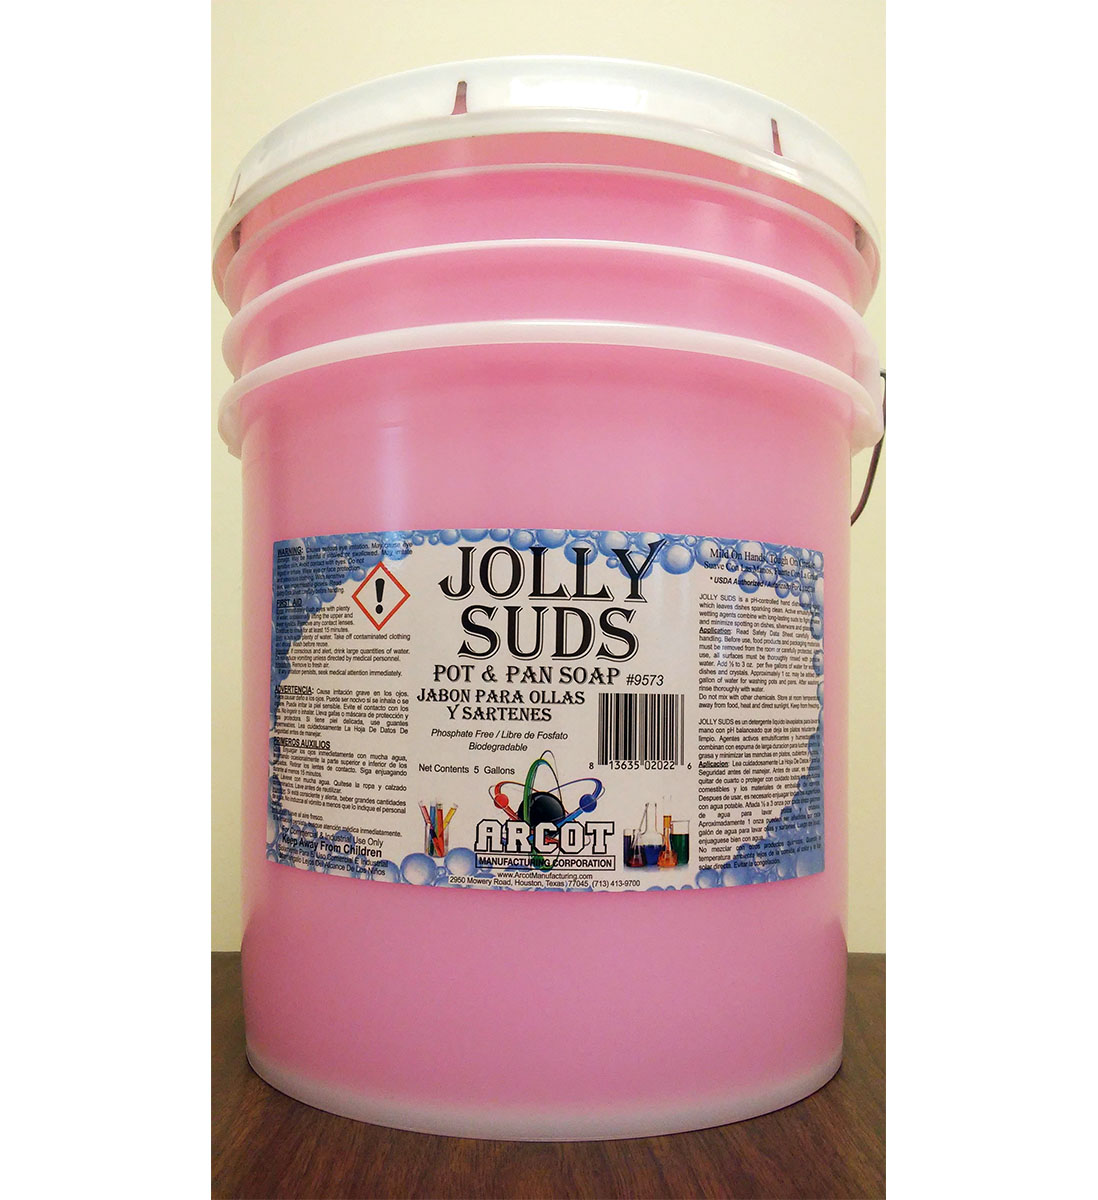 Jolly Suds 2